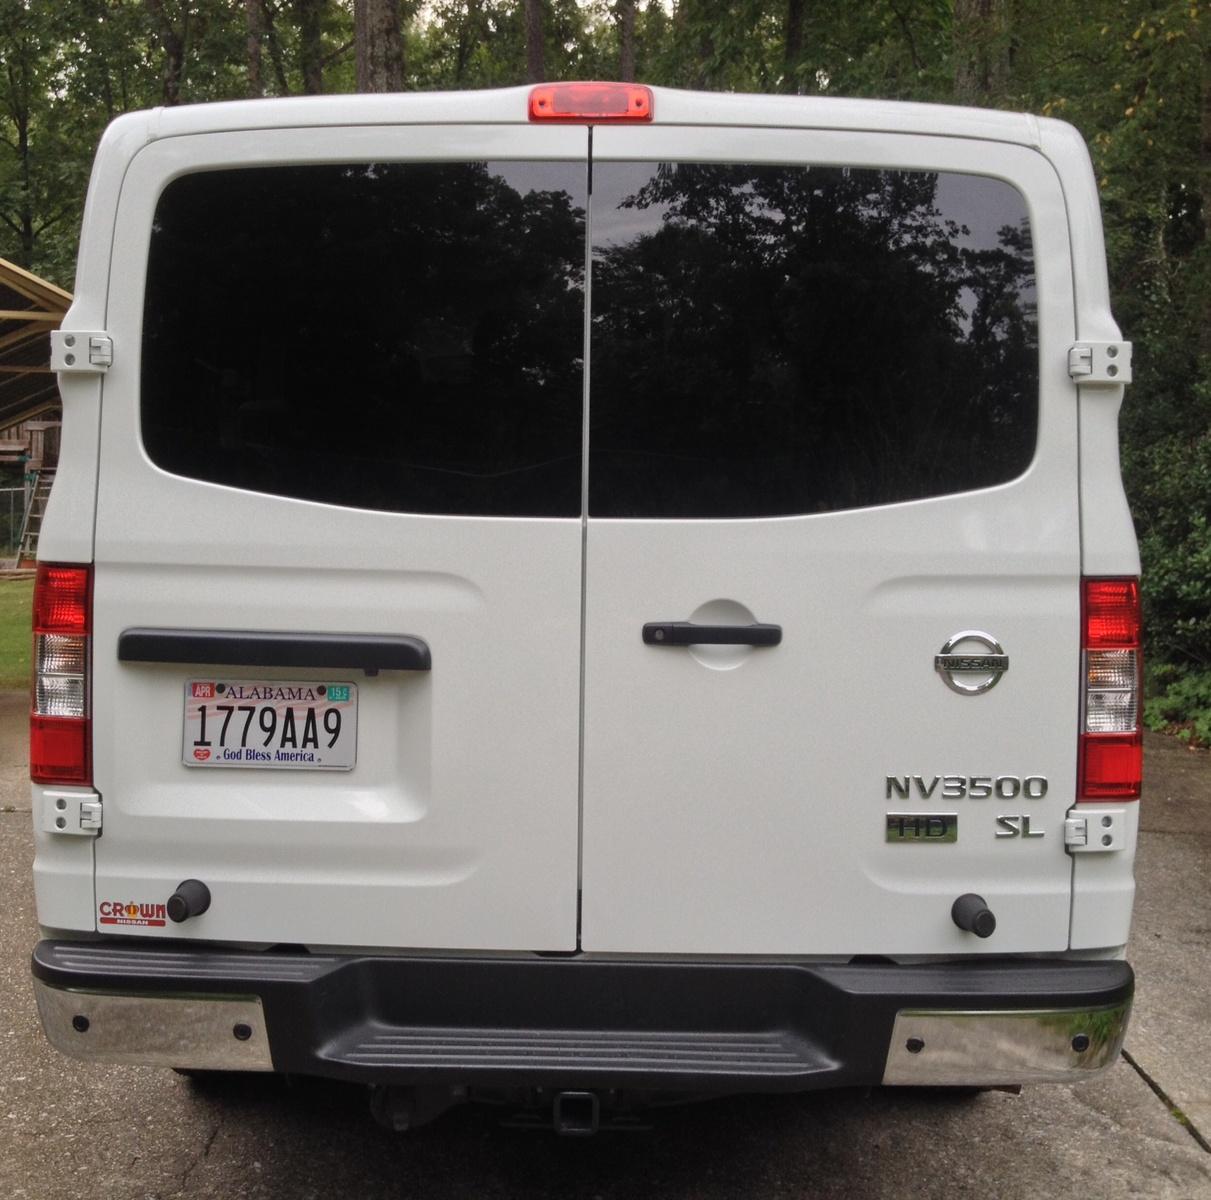 2016 Nissan Nv3500 Hd Passenger Exterior: 2013 Nissan NV Passenger